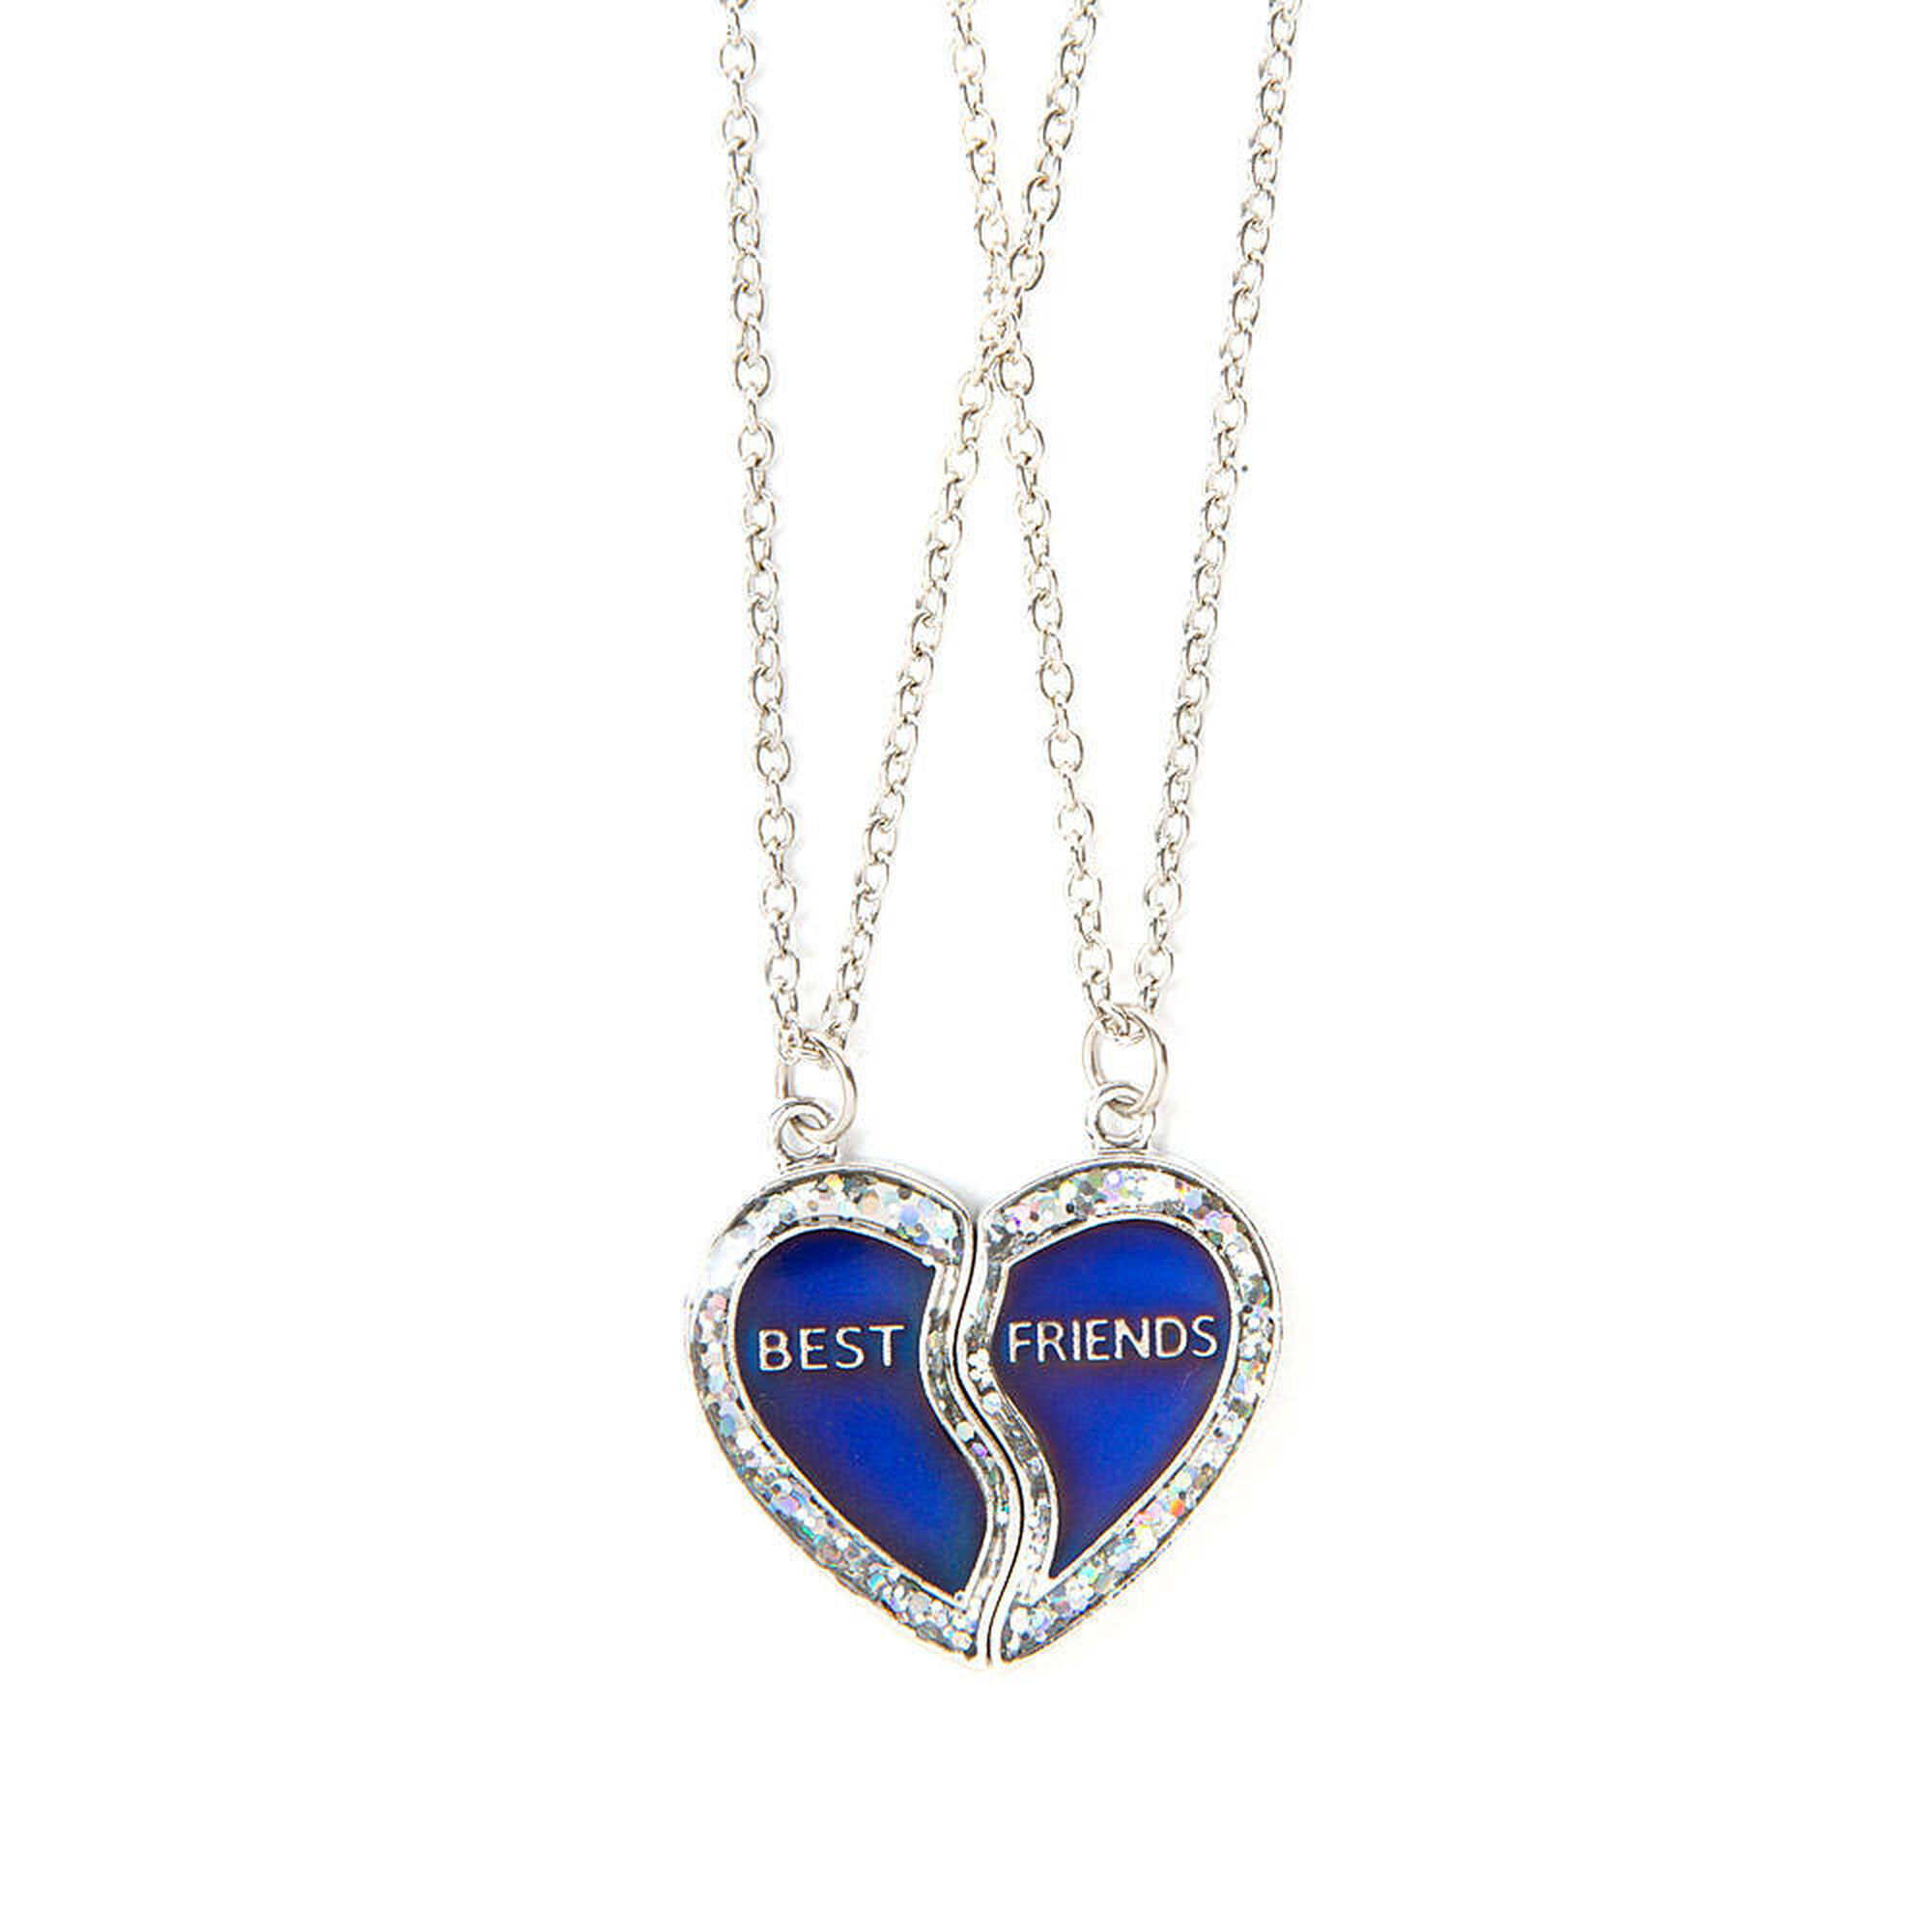 Best friends glitter mood half heart pendant necklaces claires us best friends glitter mood half heart pendant necklaces aloadofball Choice Image